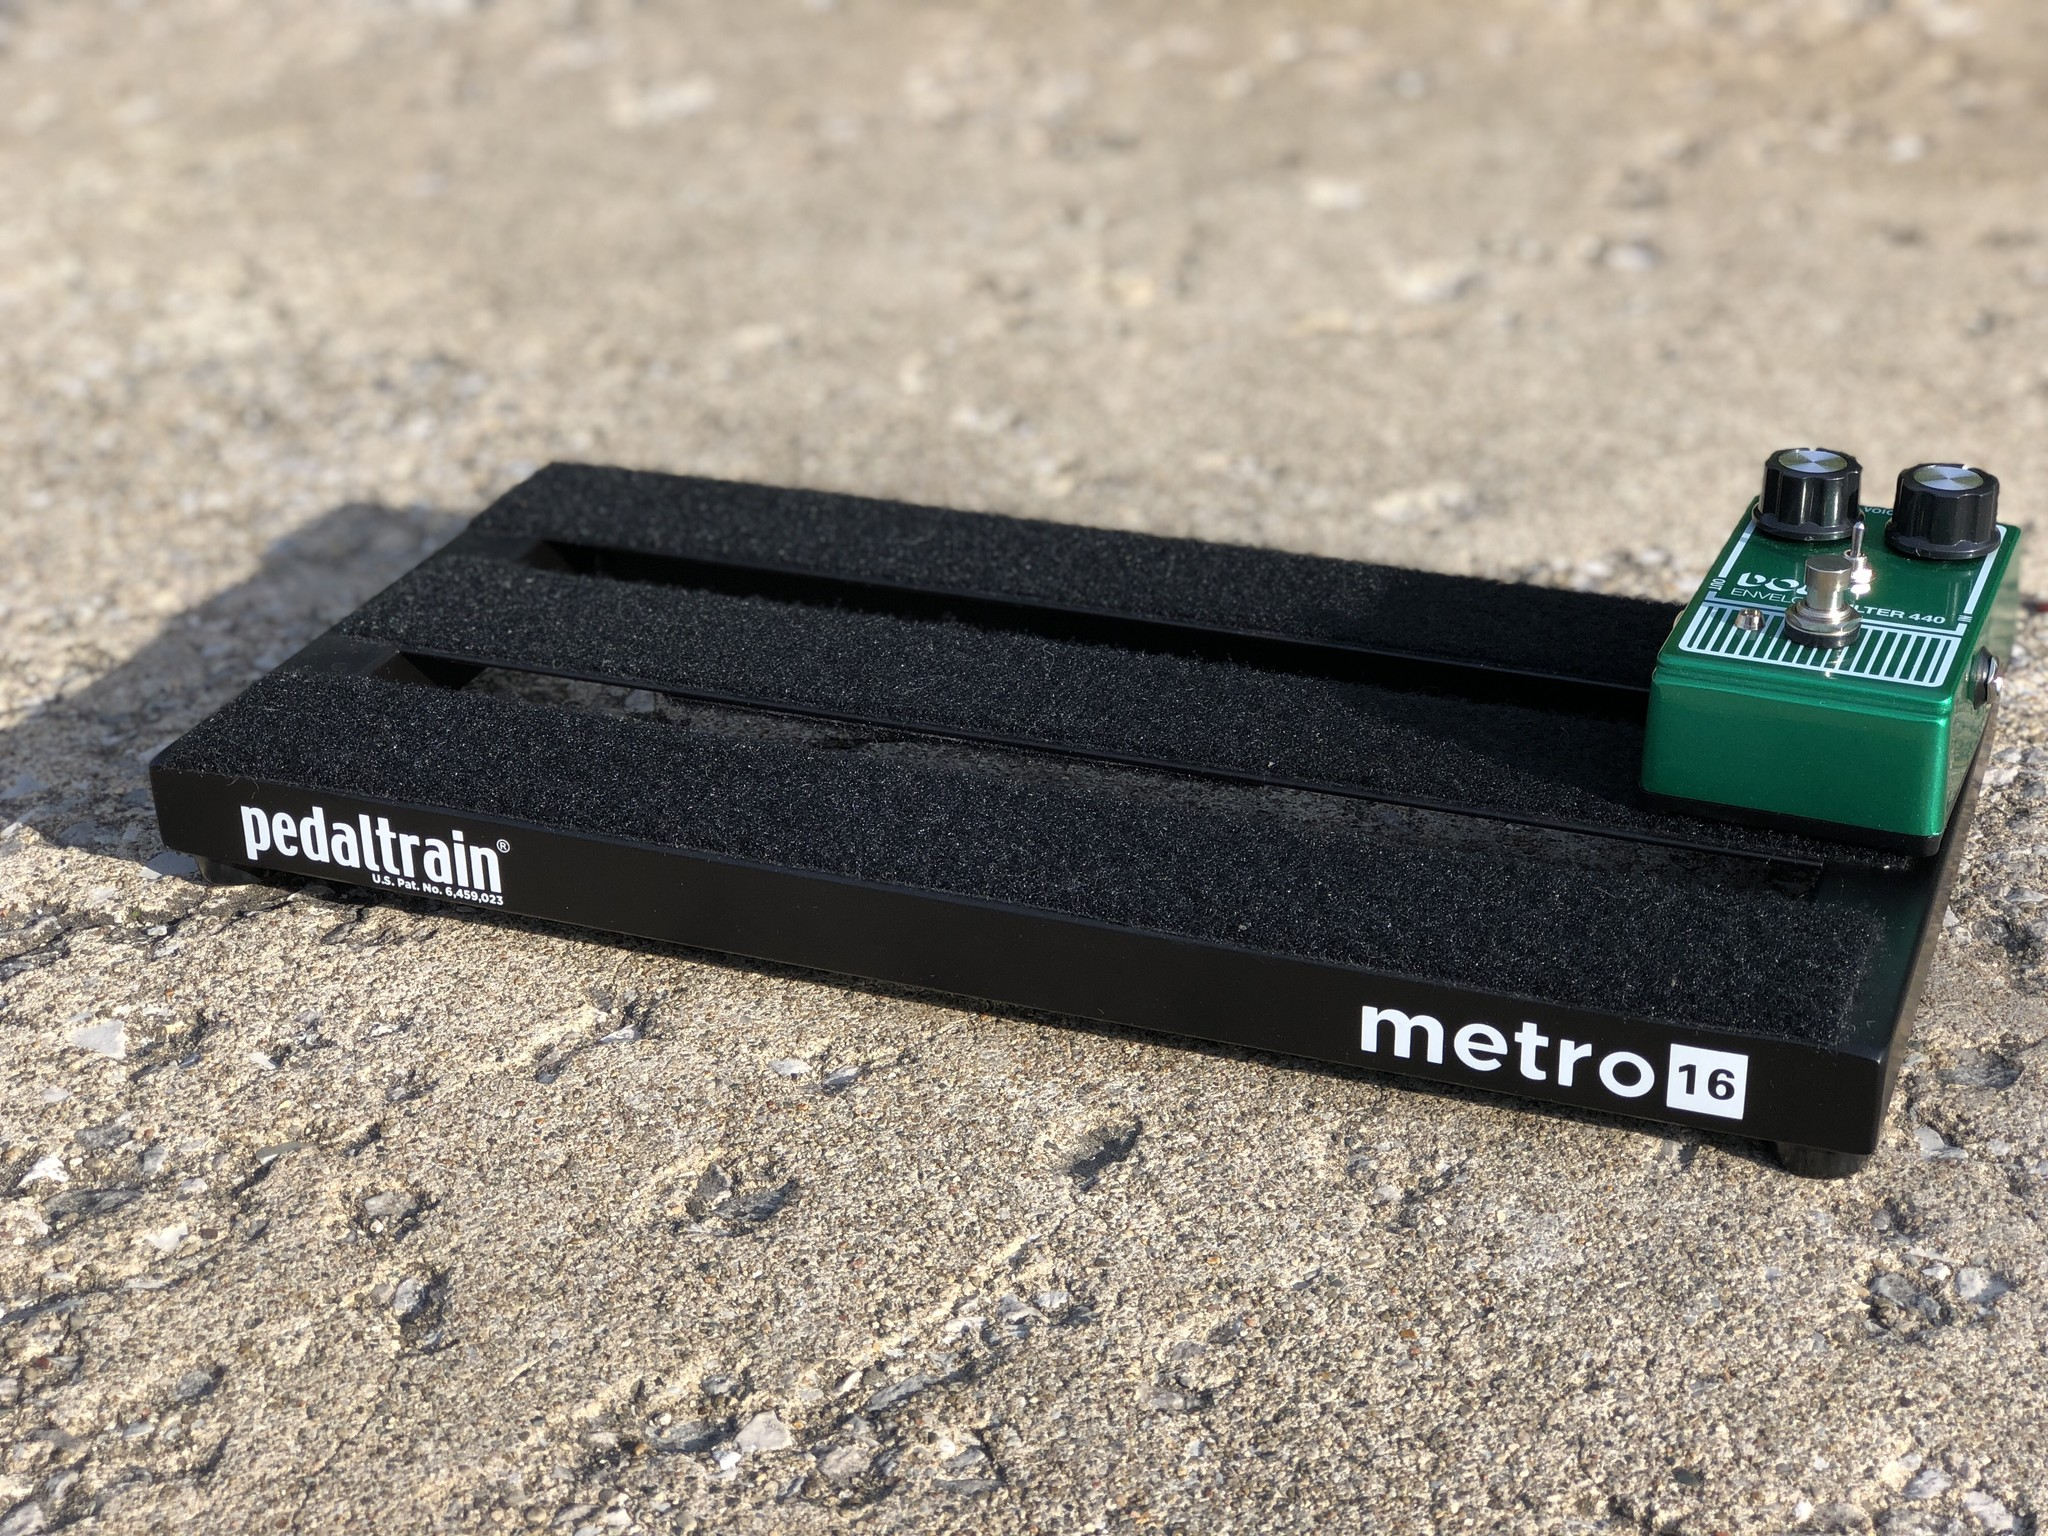 Pedaltrain Metro 16 w/softbag-3